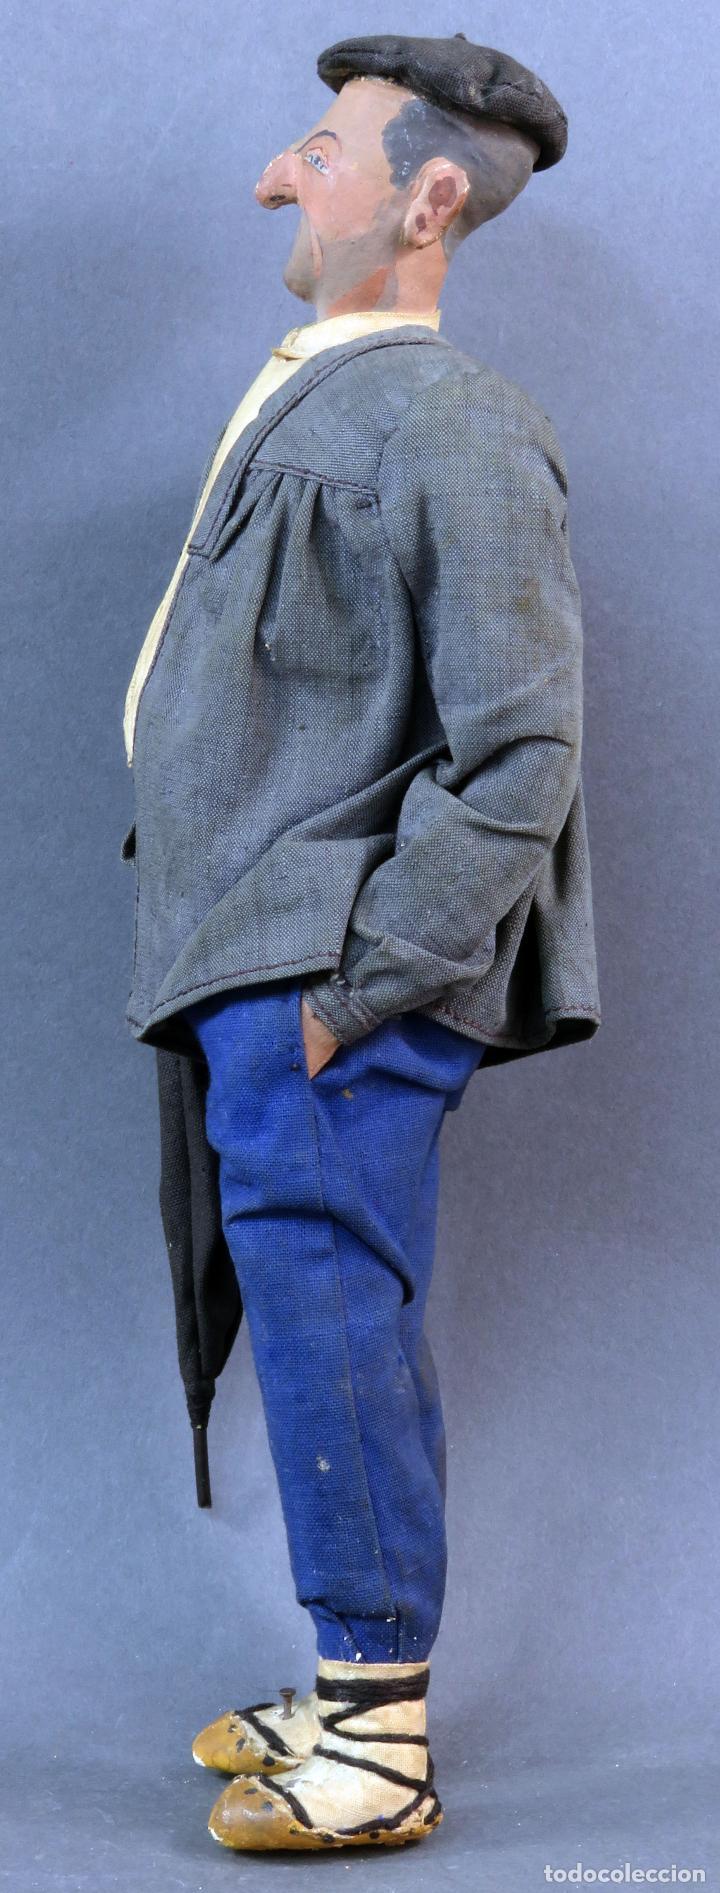 Muñeca española clasica: Paisano vasco boina paraguas cartón piedra piel y trapo años 30 30 cm alto - Foto 5 - 125831975